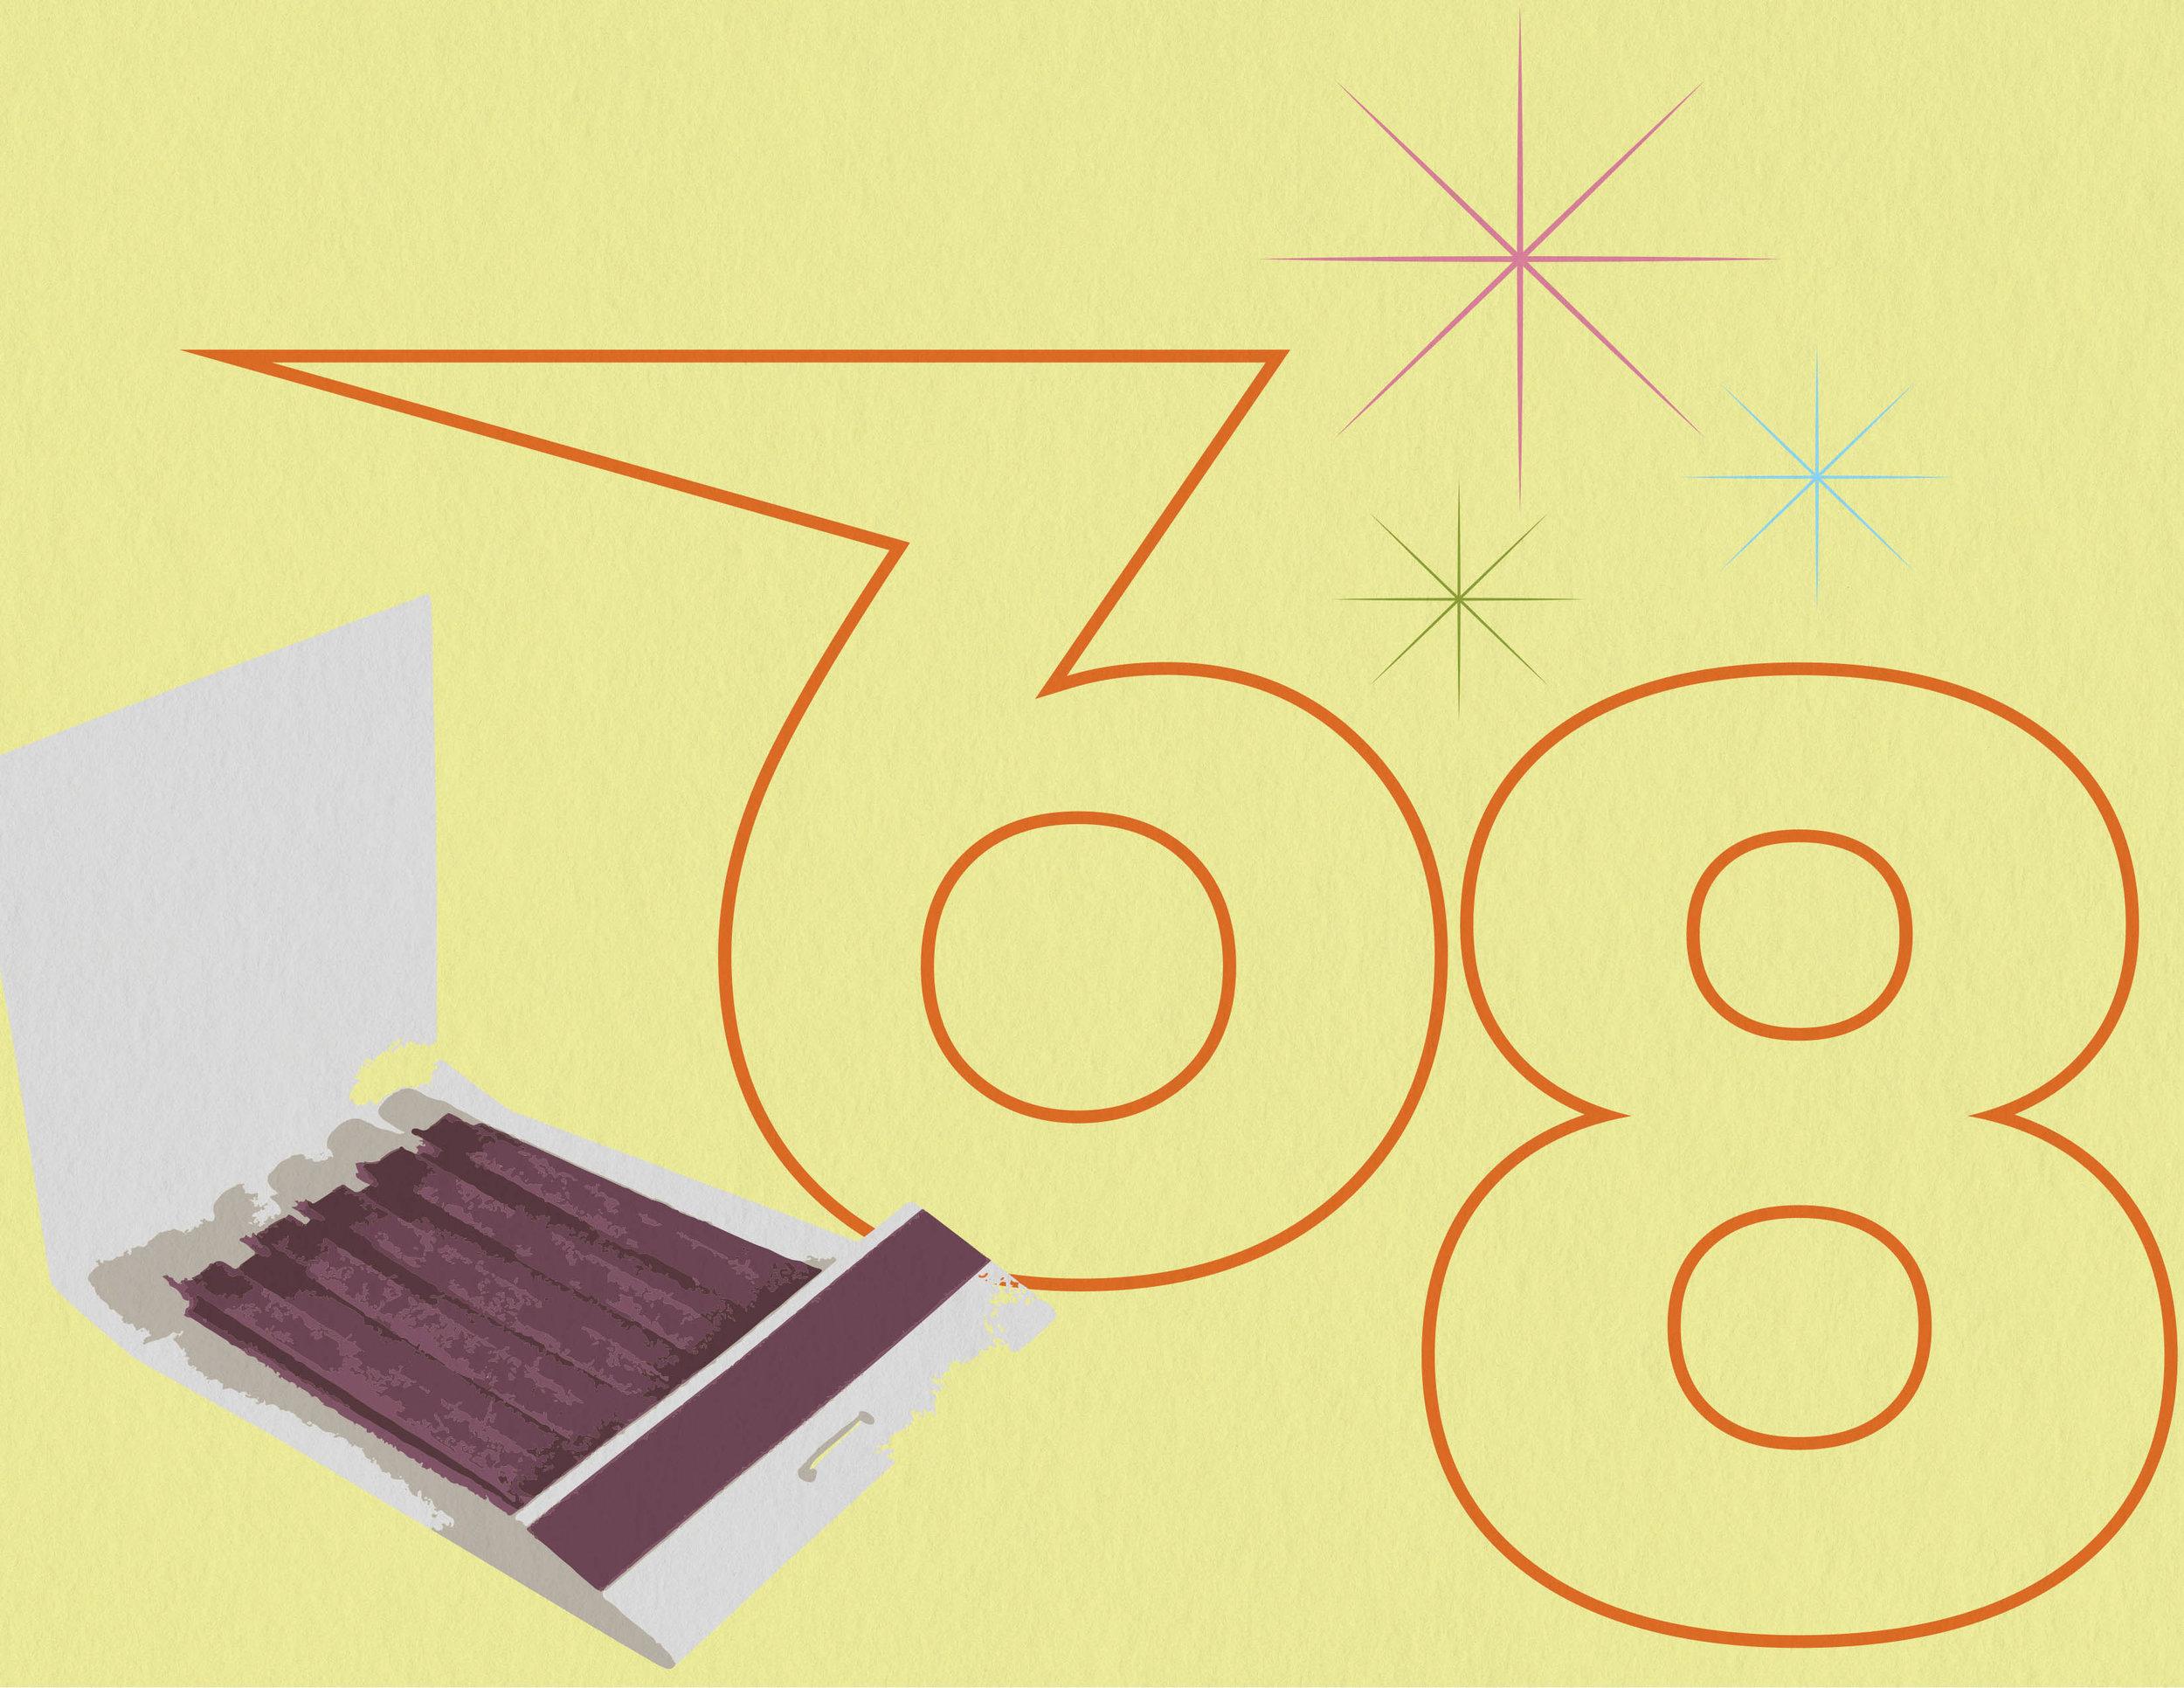 68 starburst final.jpg